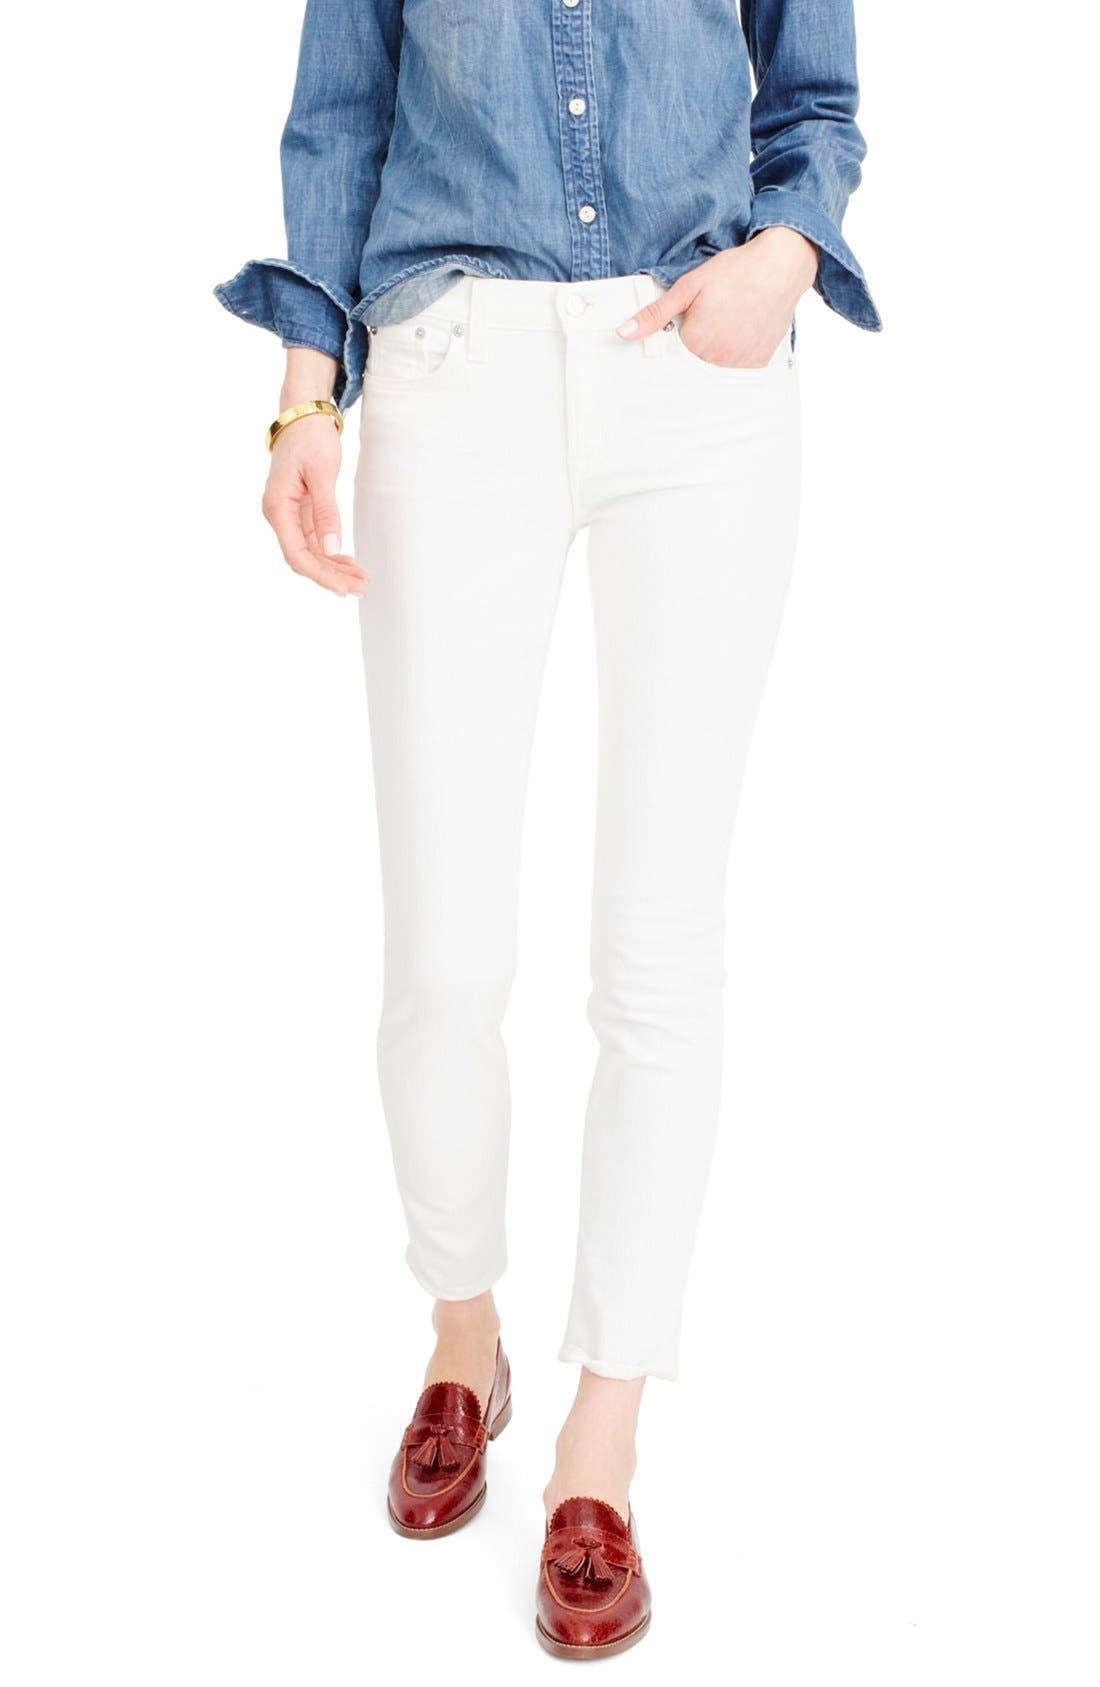 Alternate Image 1 Selected - J.Crew Toothpick Jeans (Regular & Petite)